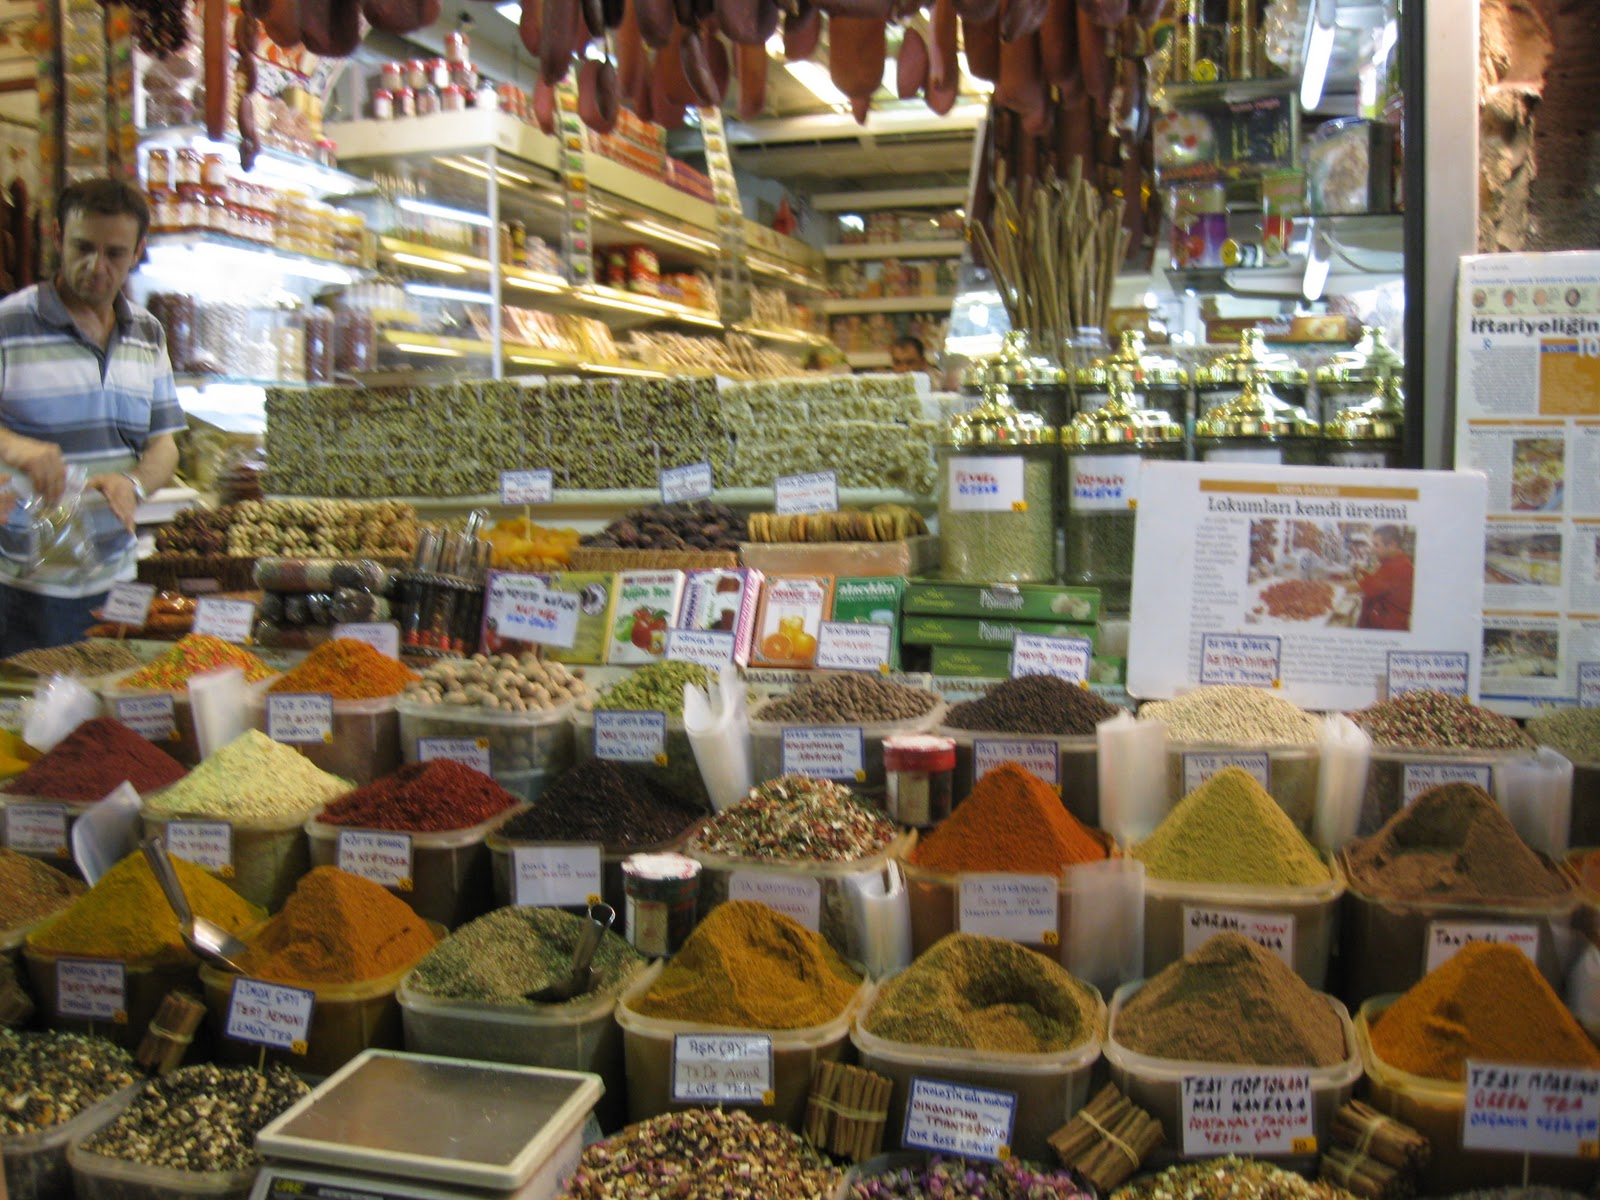 Spice market in Tunisia   Tunisia, Food market, Carthage   Middle East Spice Market